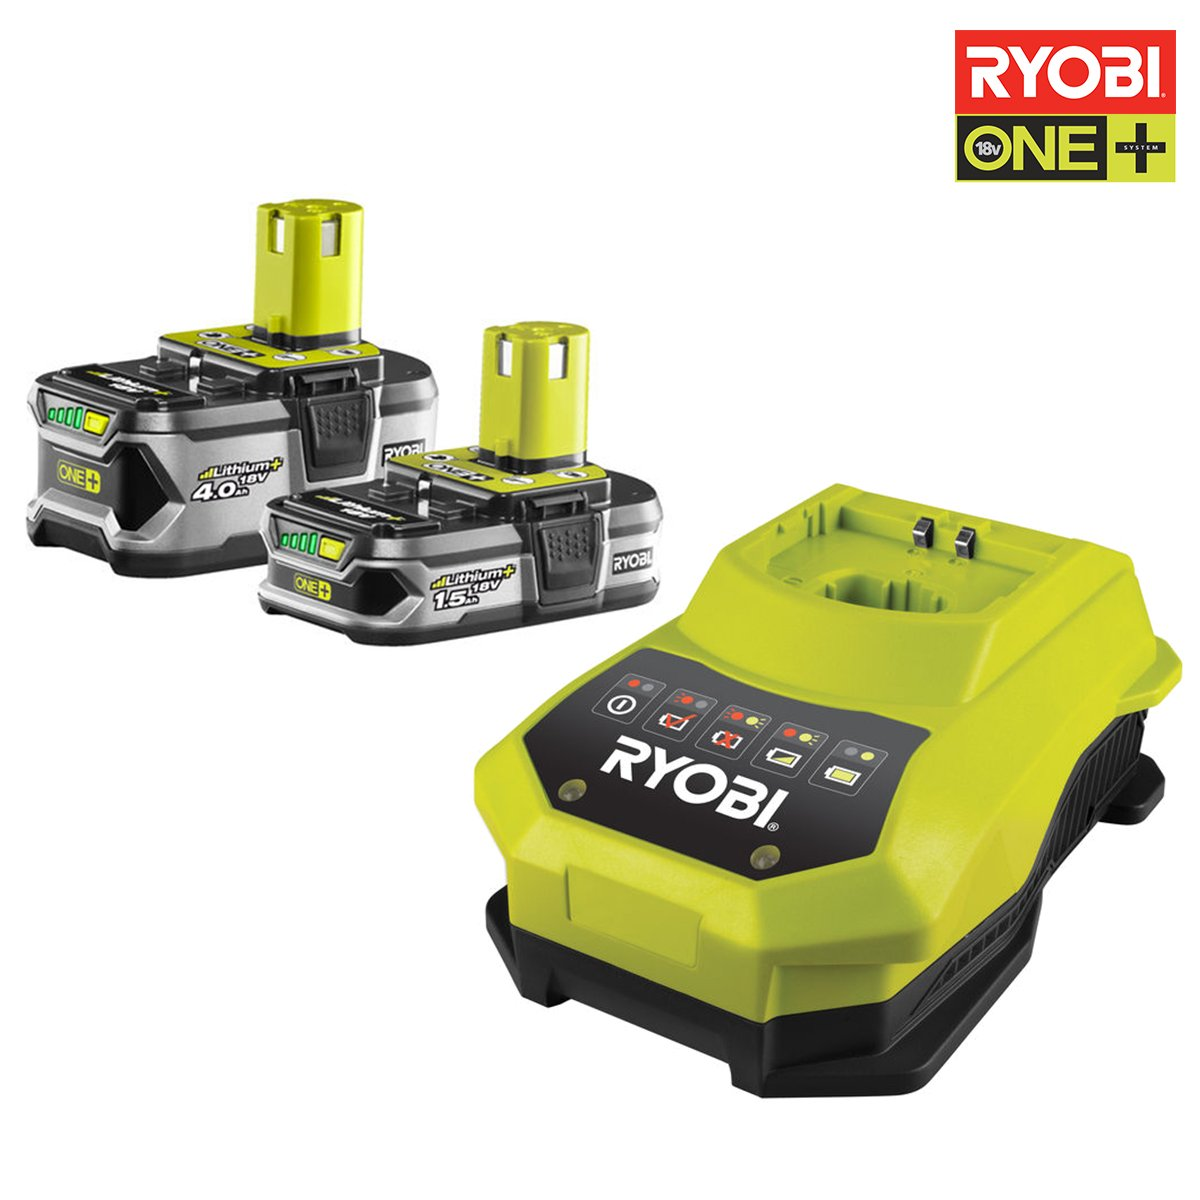 Ryobi Akku RBC18LL415 und Ladegerät, 18 V, 1 Stück, schwarz / grün, 5133002600